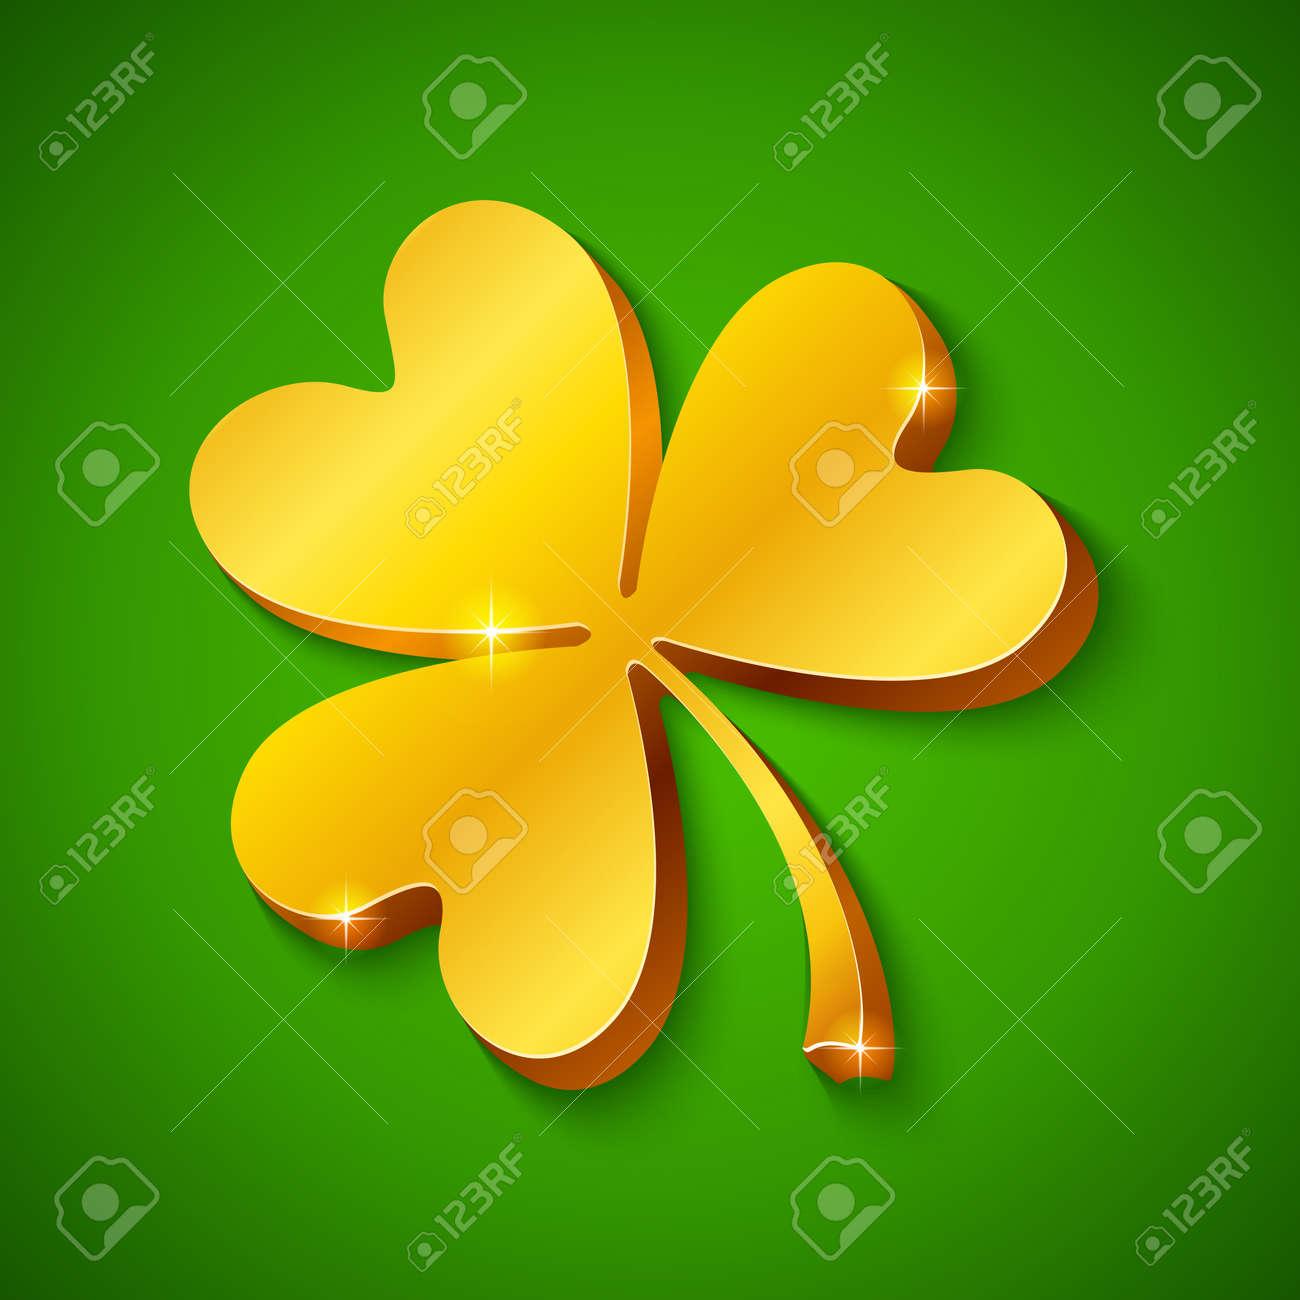 Golden clover on the green background Stock Vector - 16296082